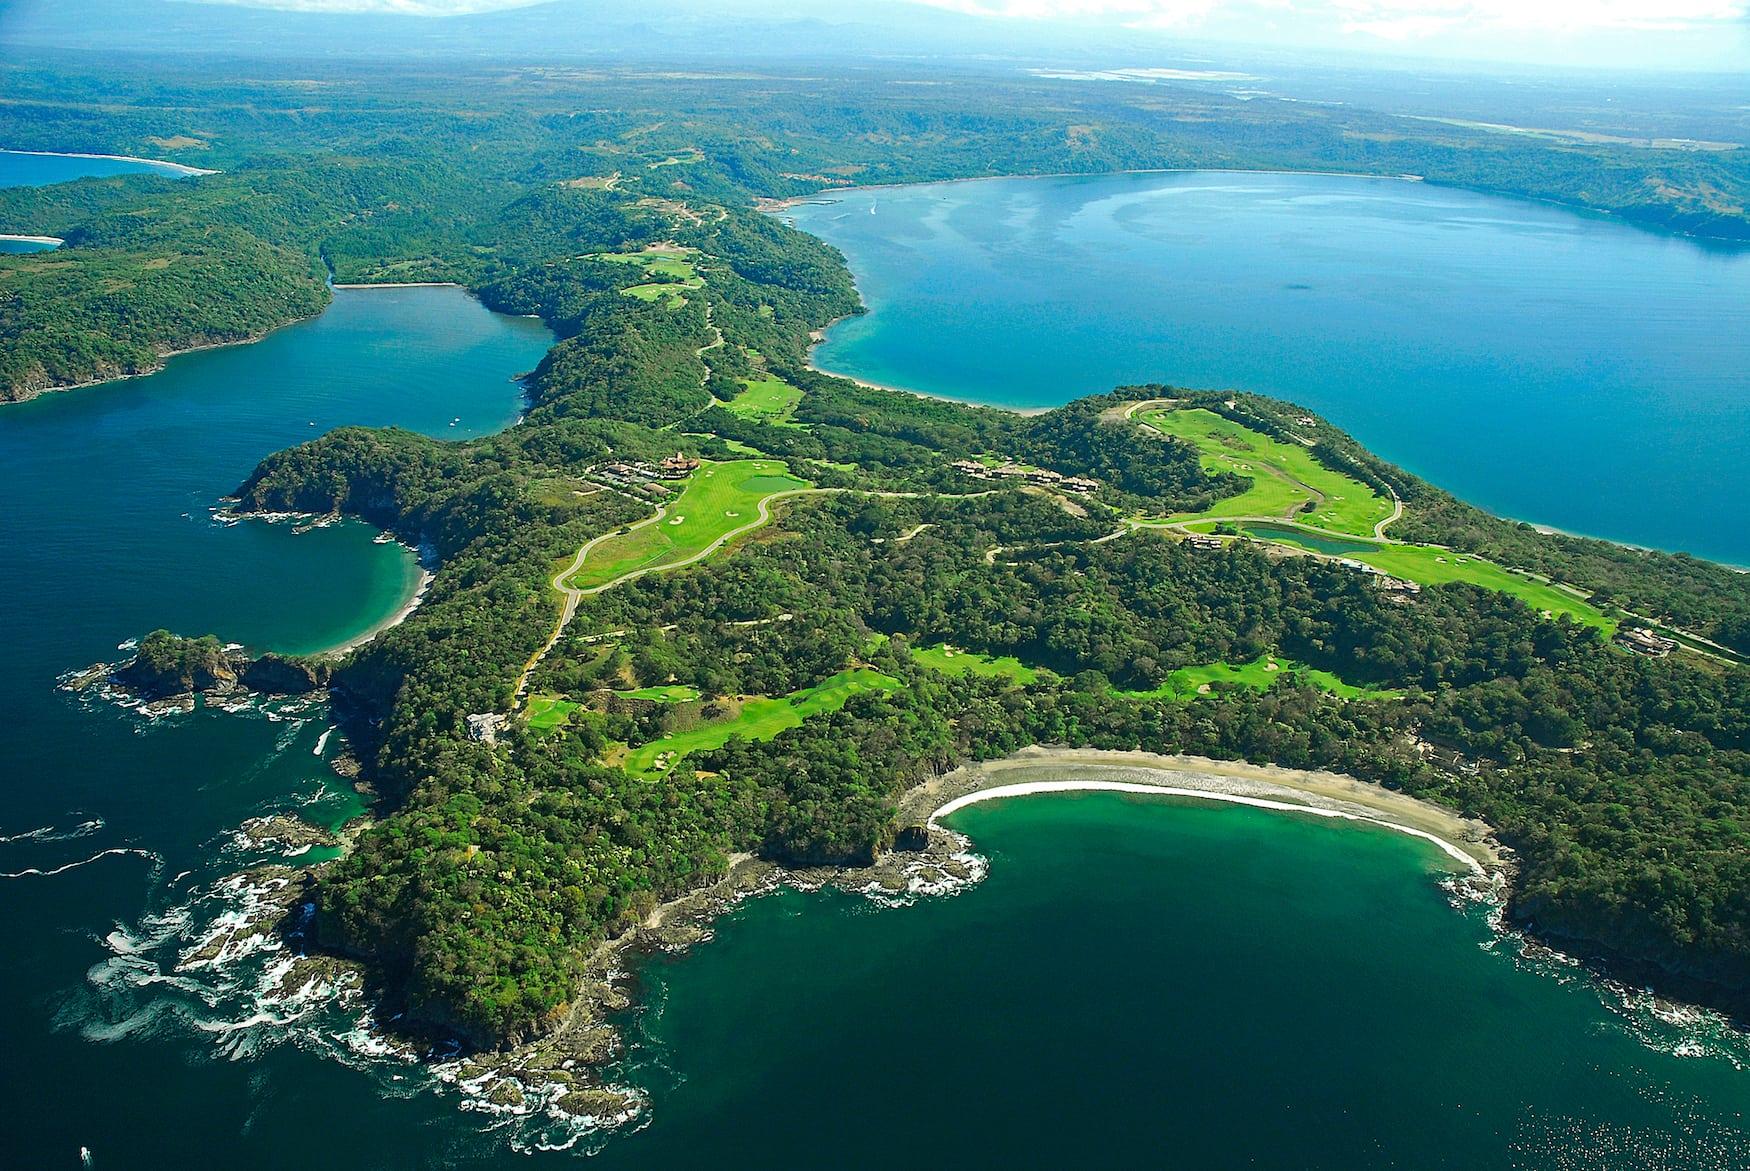 Grüne Peninsula de Papagayo in Guanacaste, Costa Rica